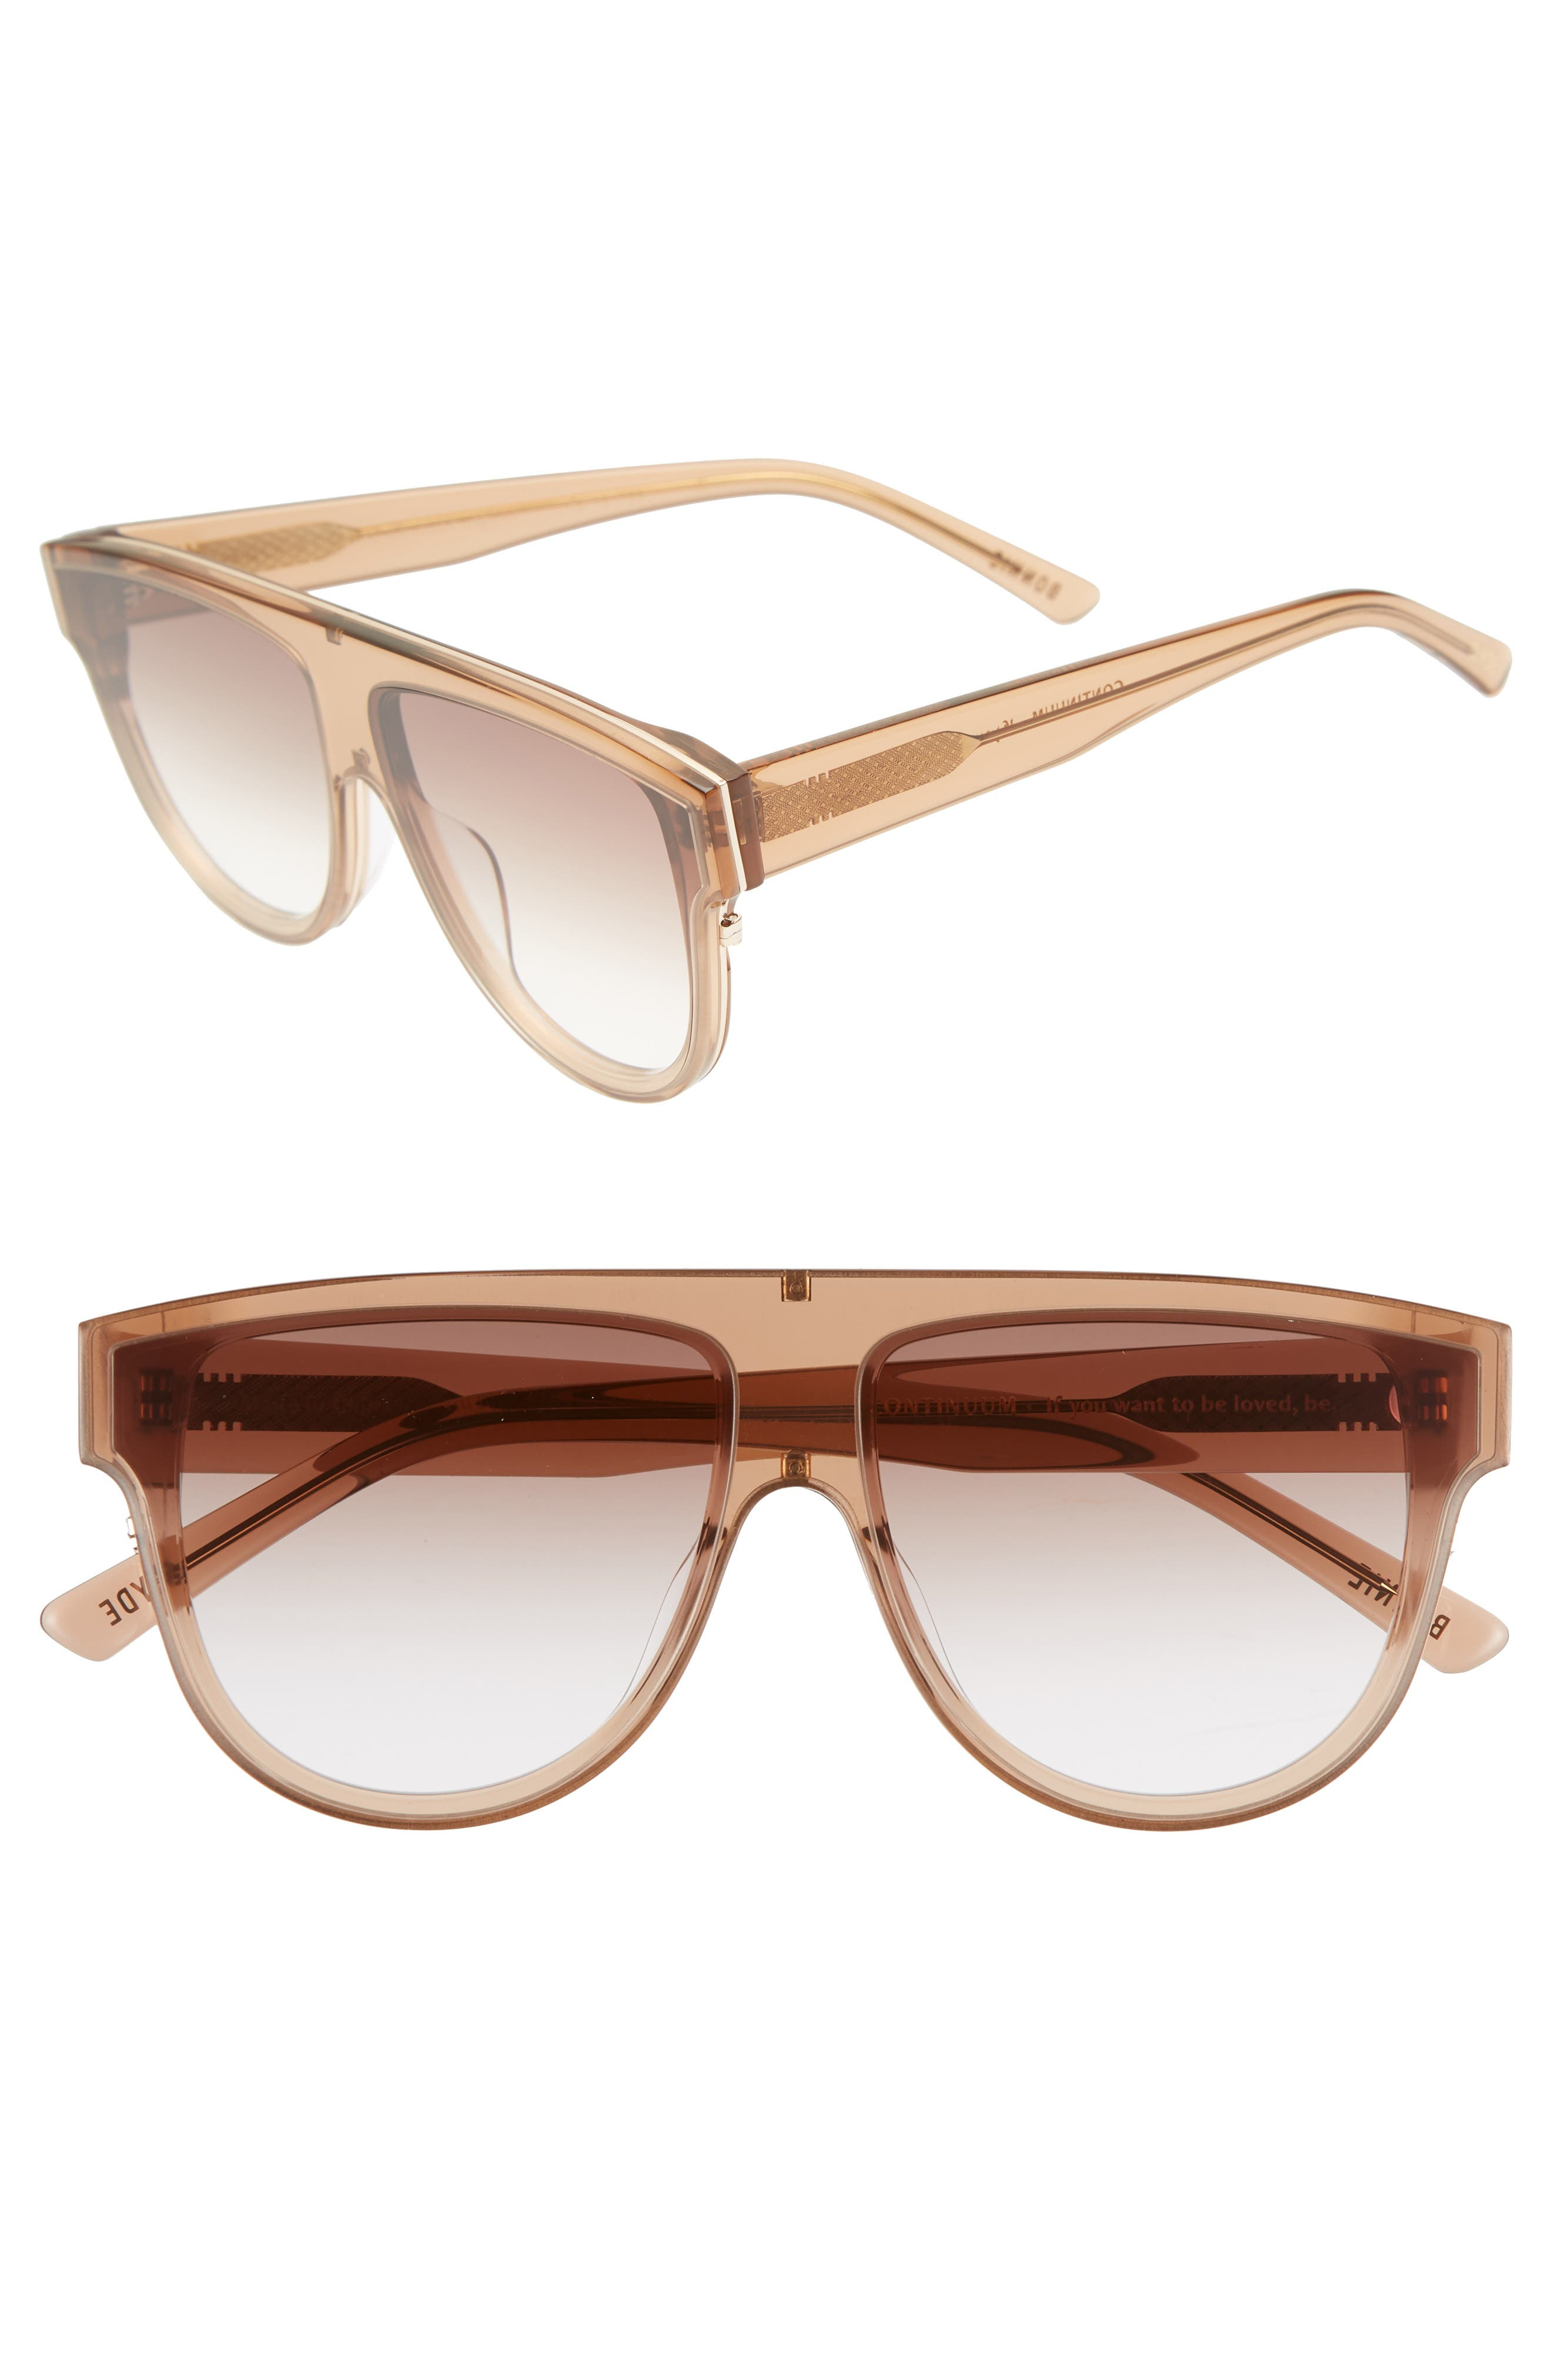 Continuum 63mm Oversize Flat Top Sunglasses,                             Main thumbnail 1, color,                             AMBER GRADIENT